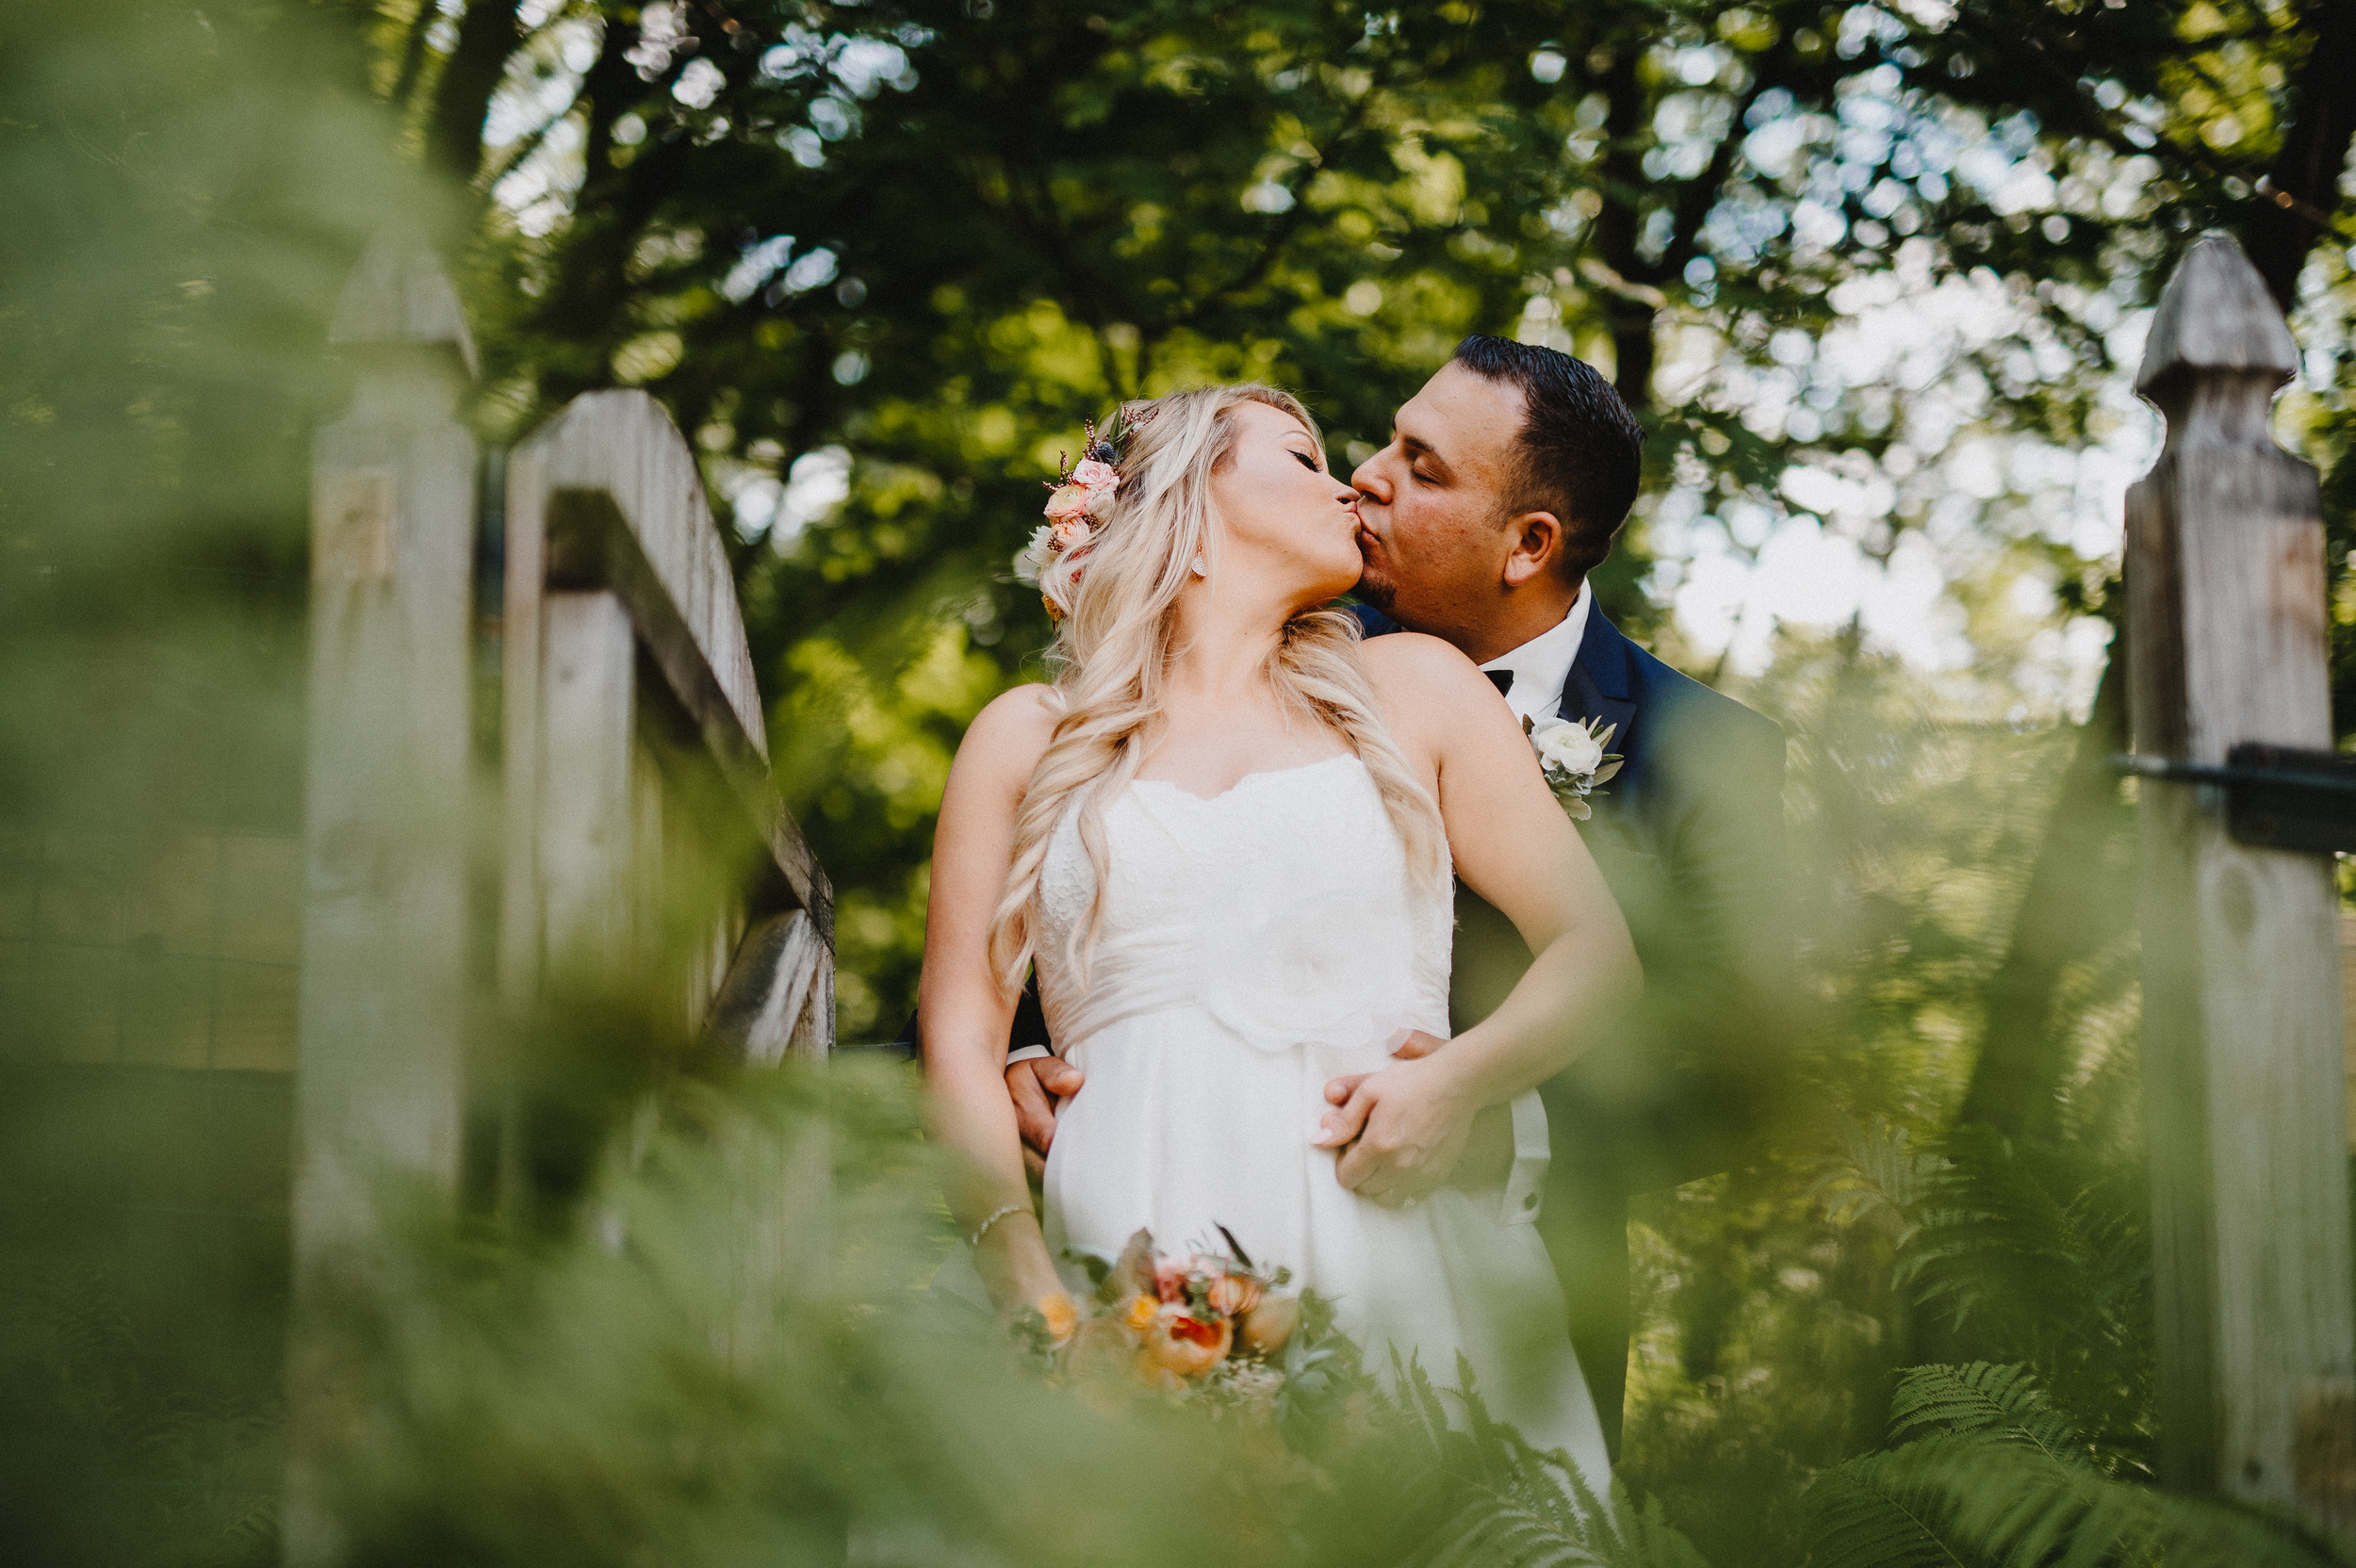 holly-hedge-estate-wedding-photographer-pat-robinson-photography-38.jpg